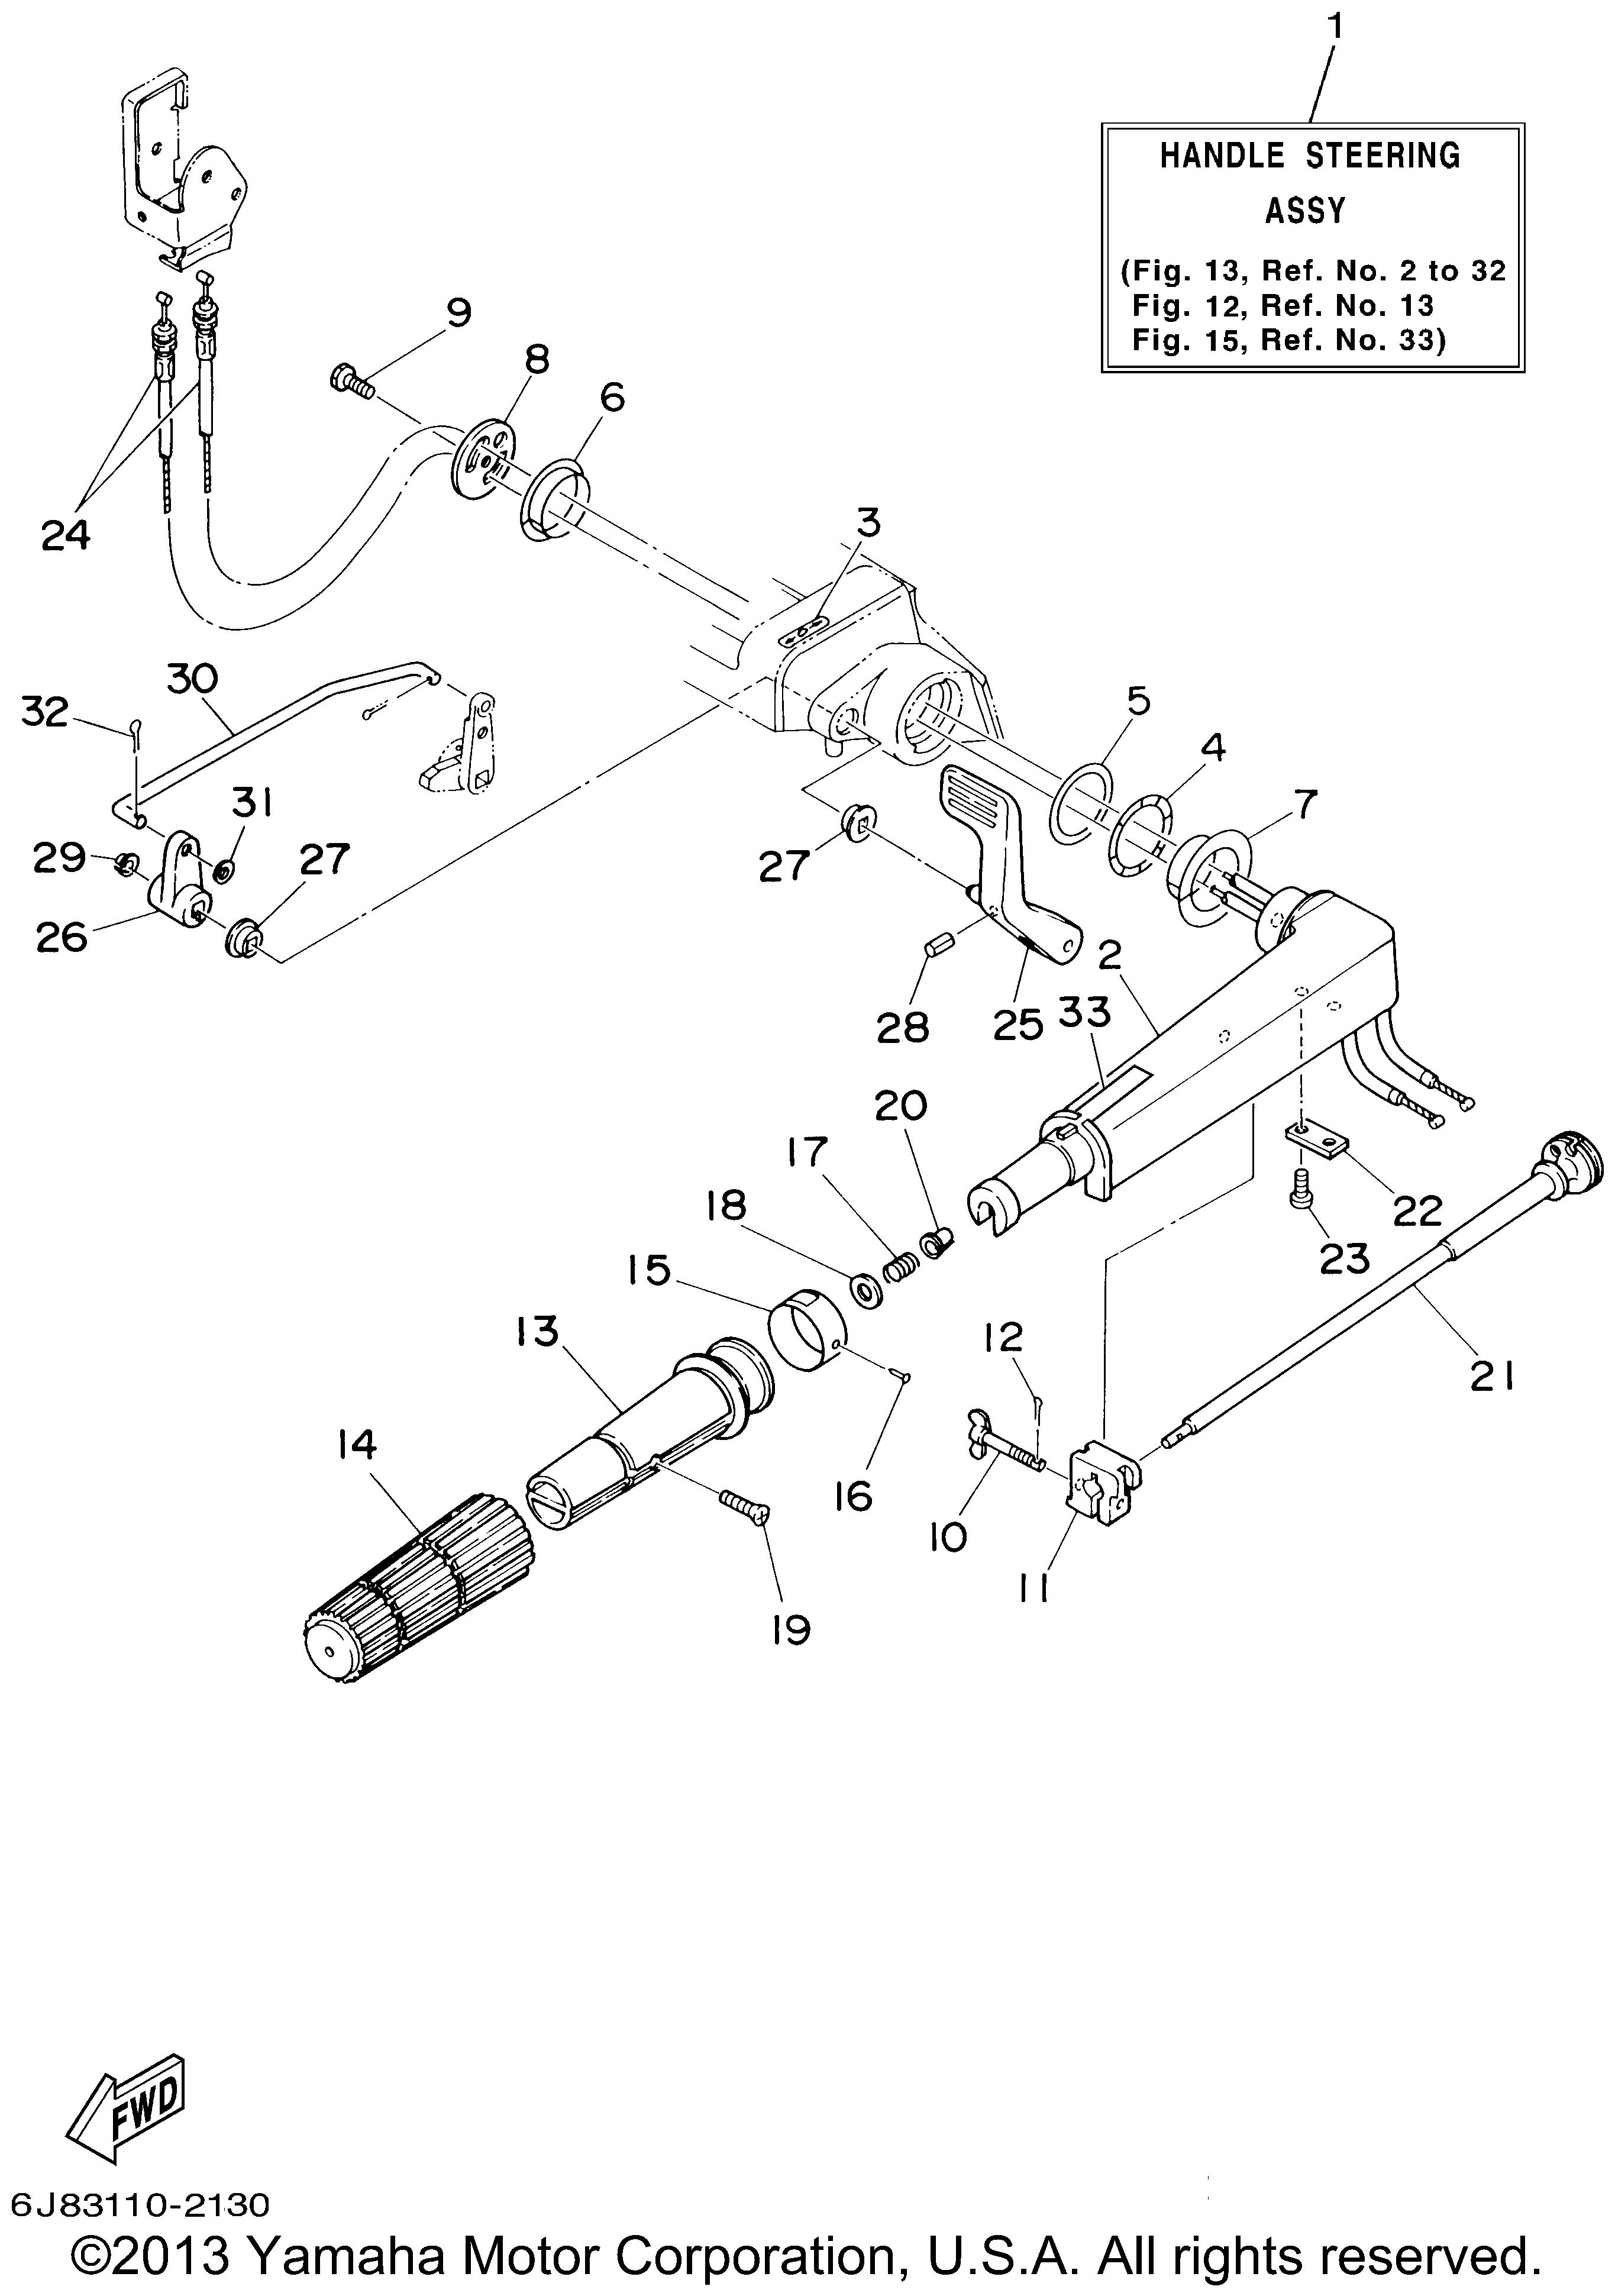 Diagram Also Yamaha Ttr 125 Carburetor Diagram On Yamaha Ttr 125